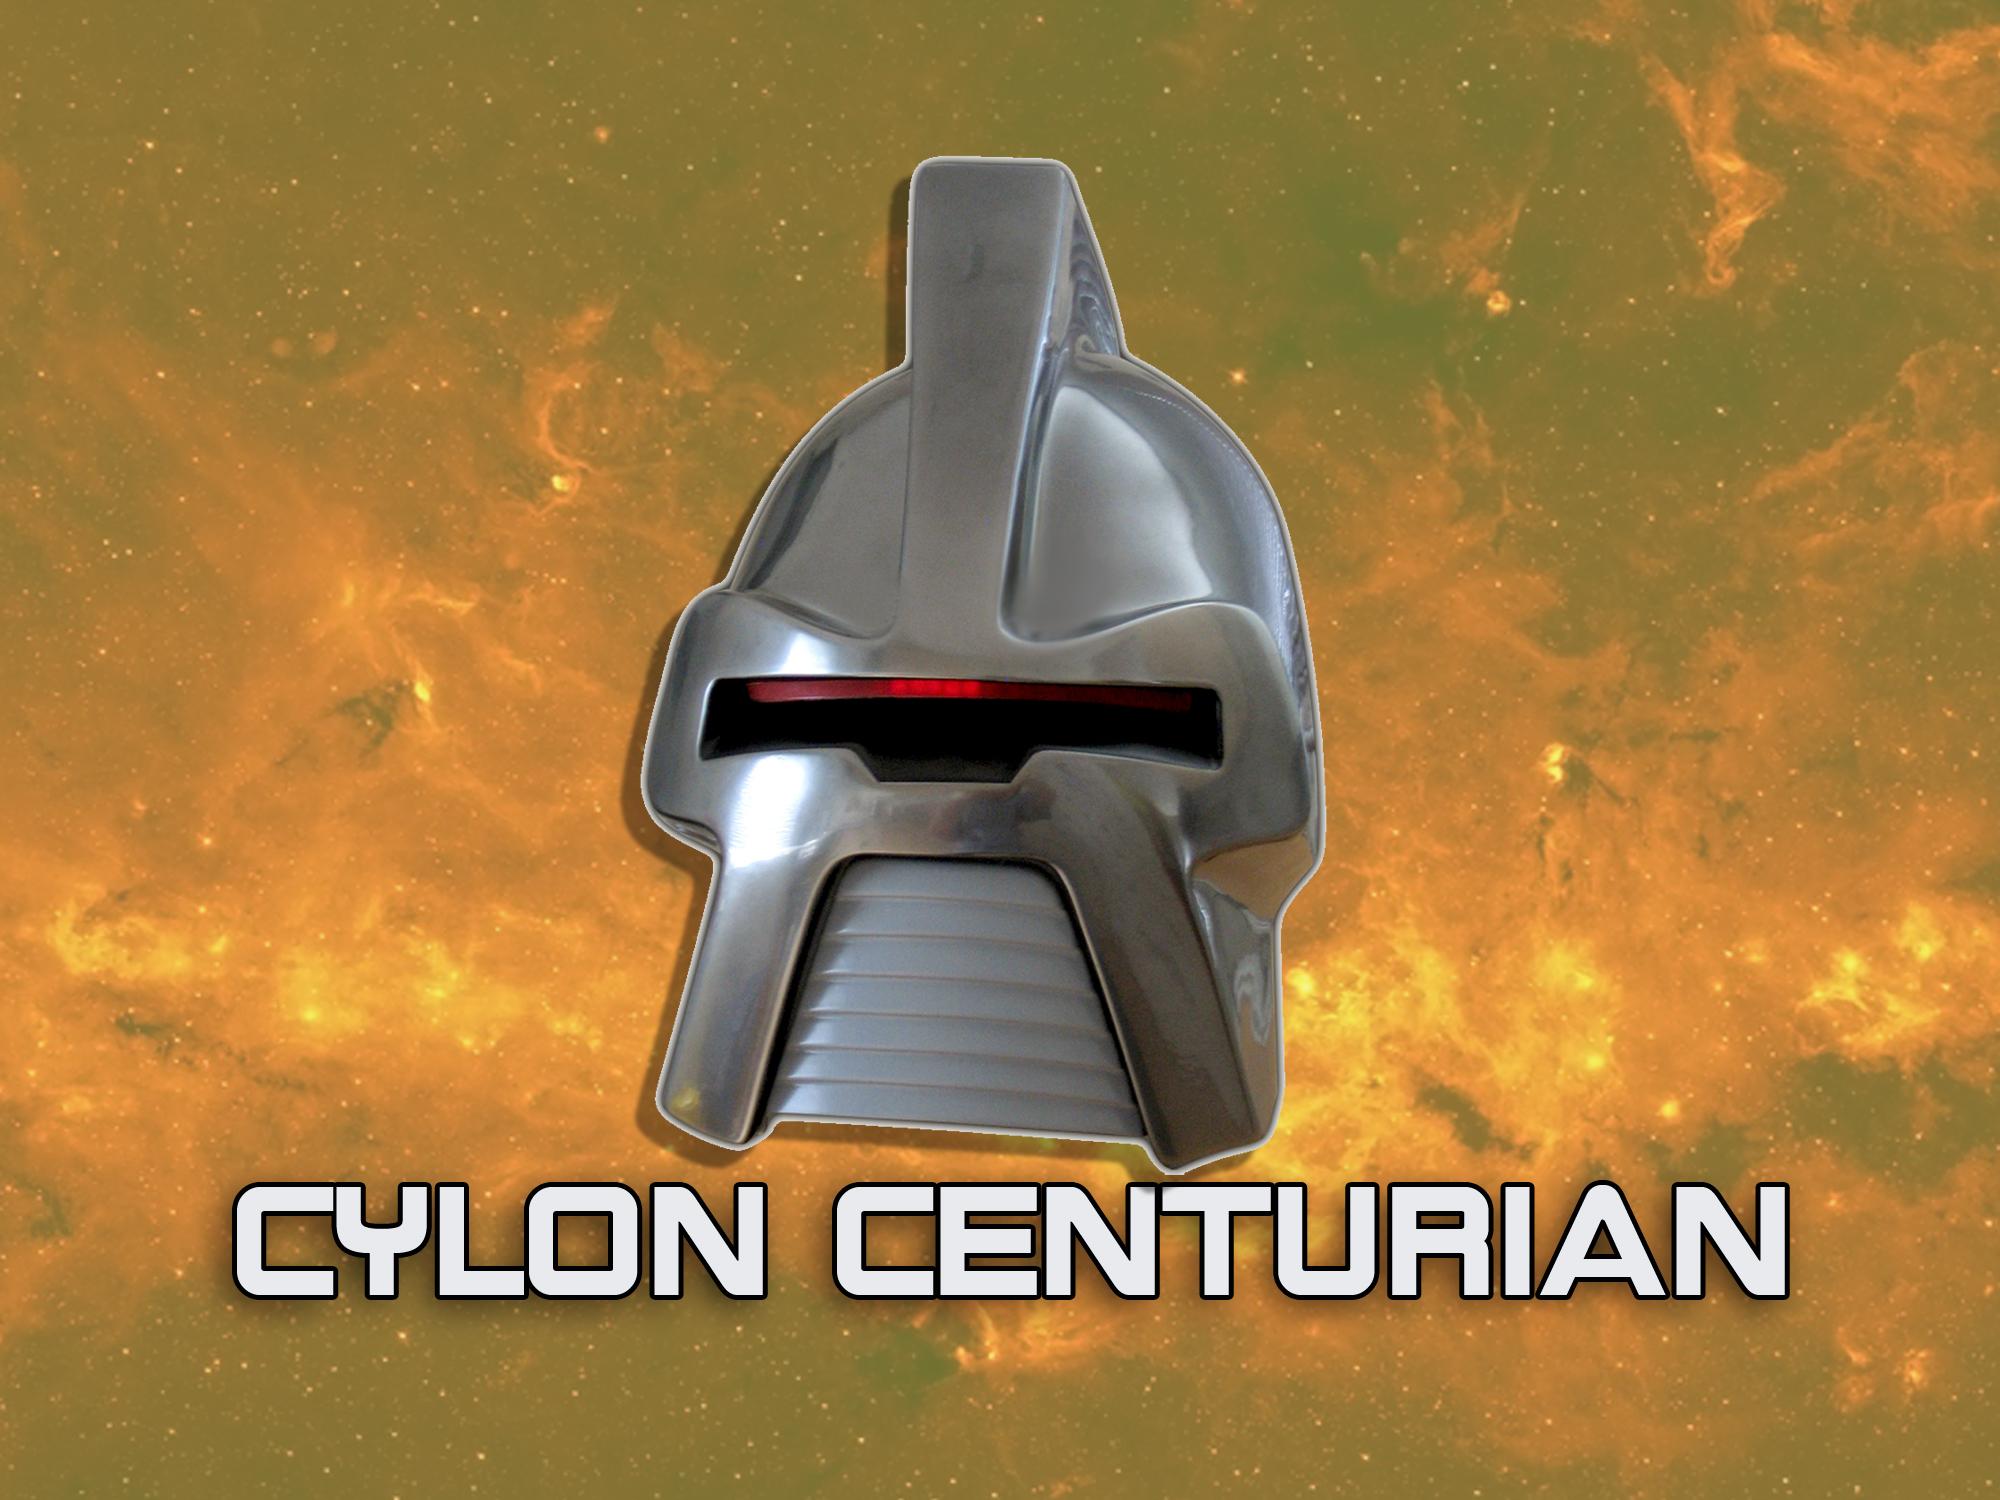 CYLON CENTURIAN ROTARY SLIDE